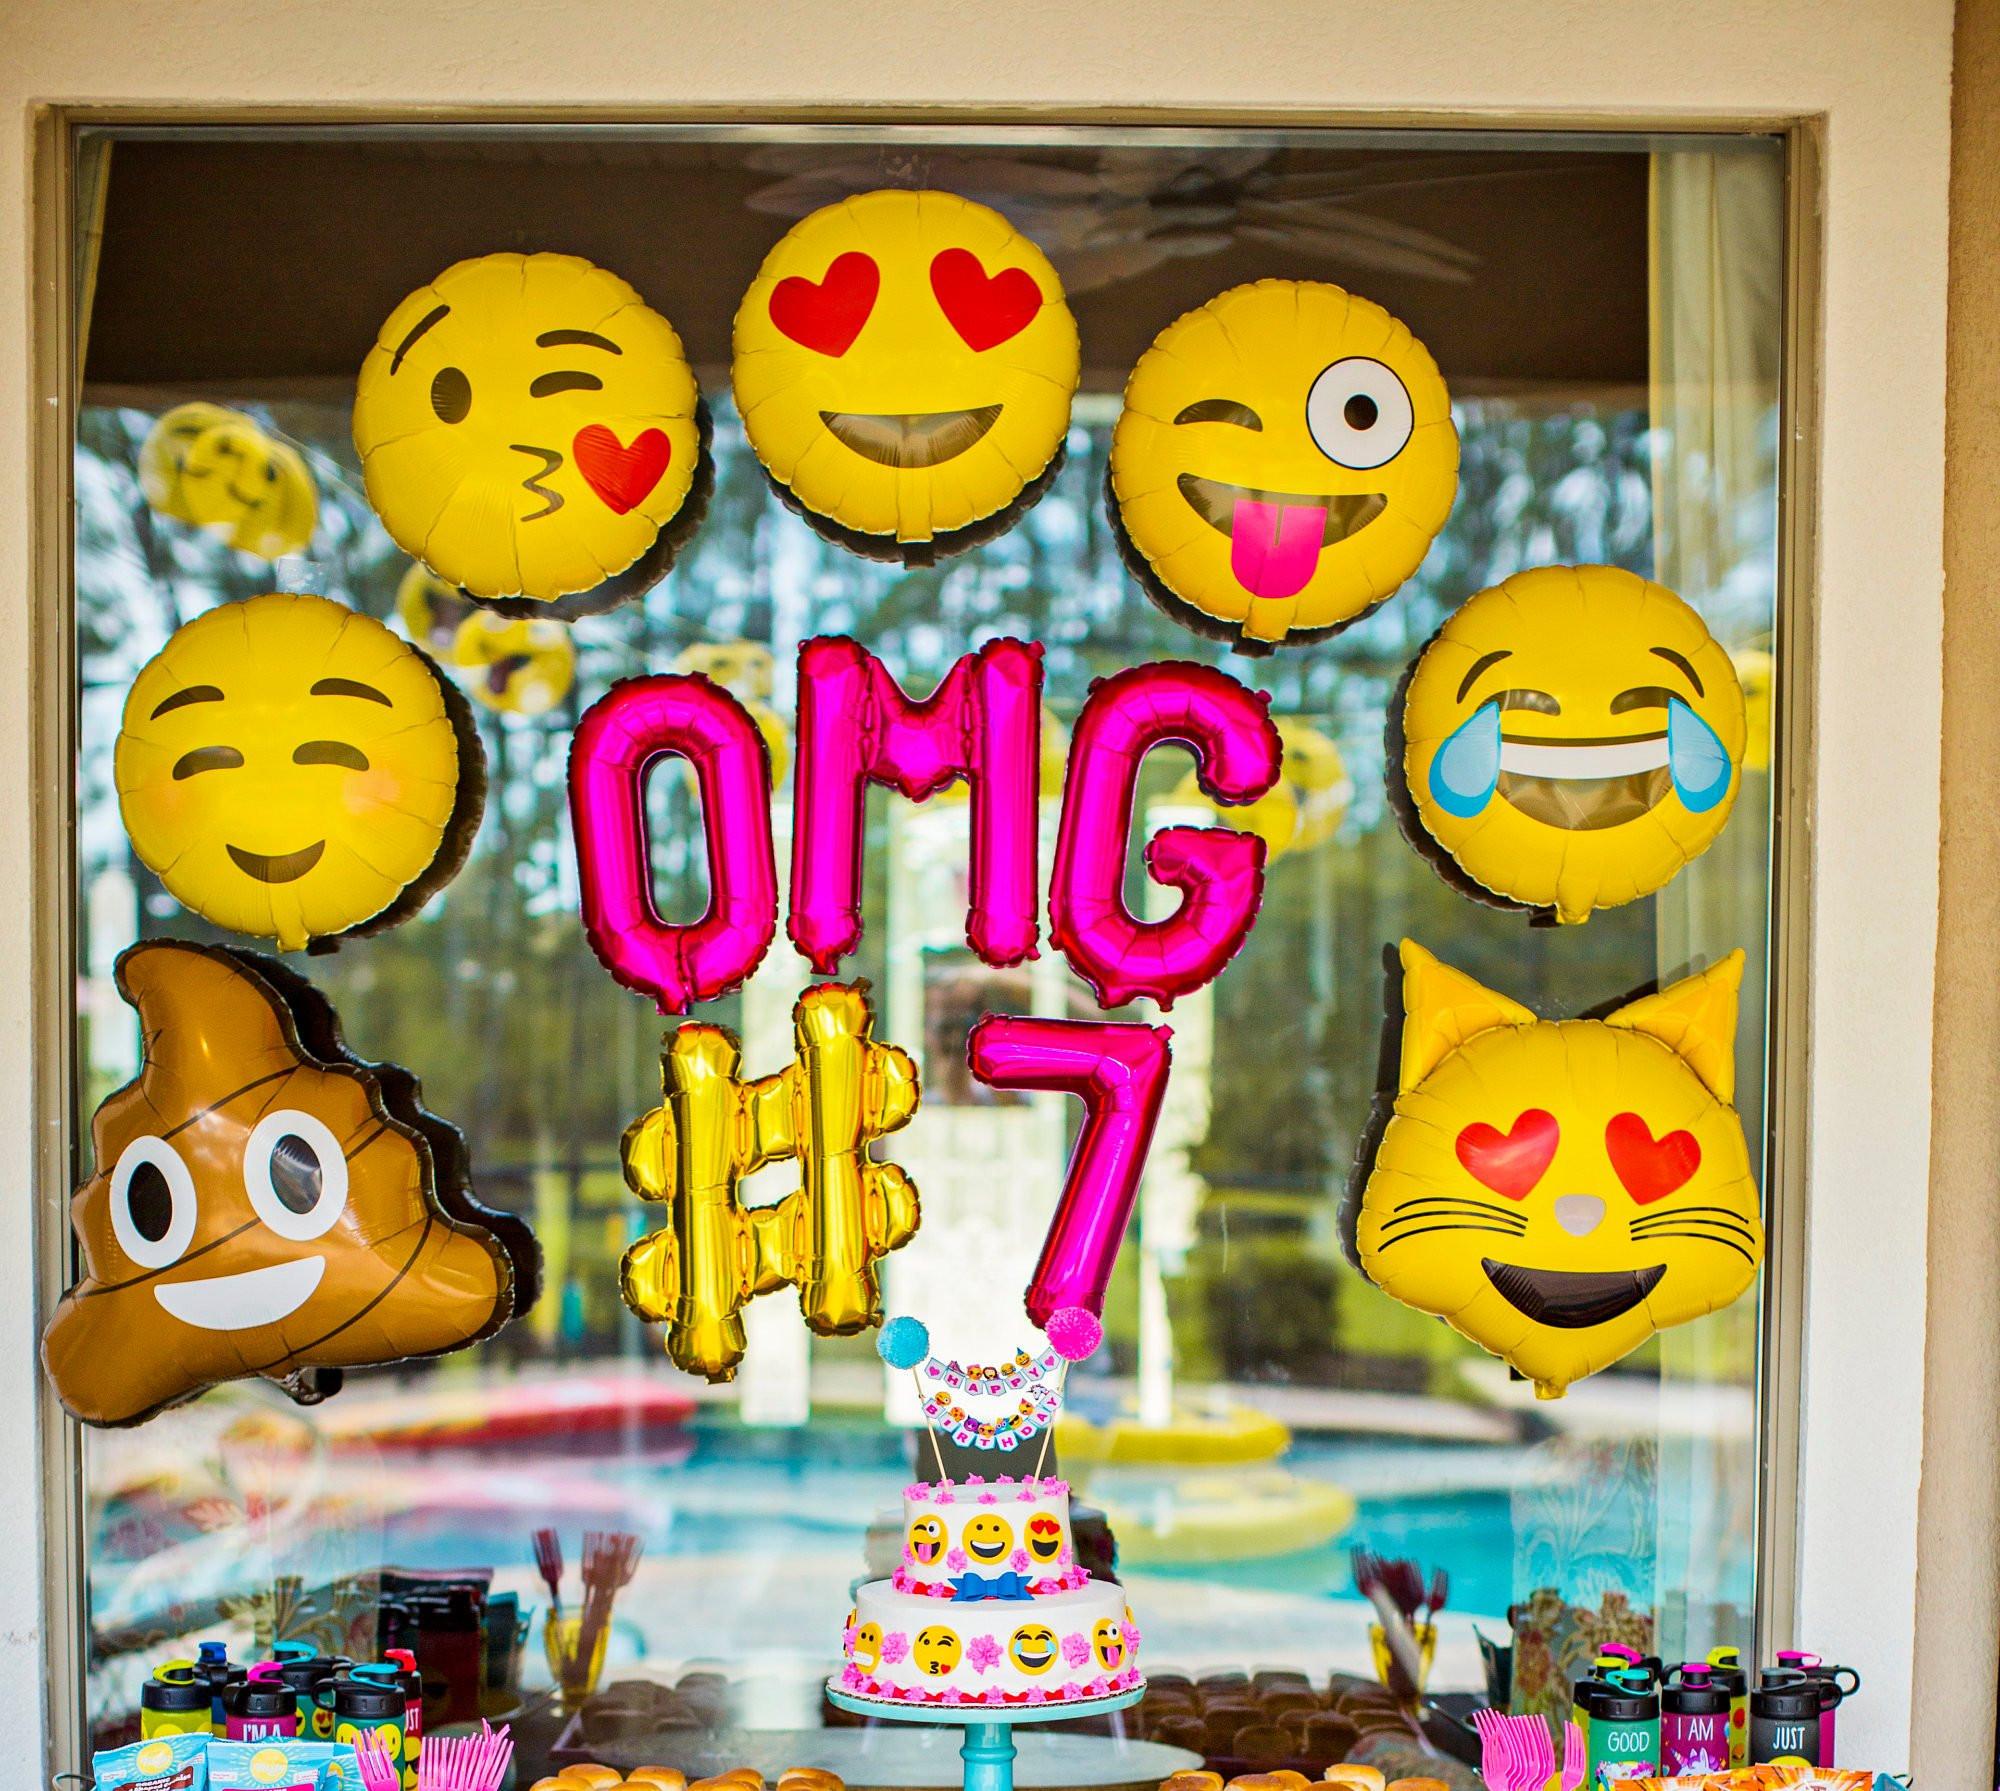 Emoji Birthday Decorations  Emoji Party Emoji Balloons OMG Party Emoji Decorations